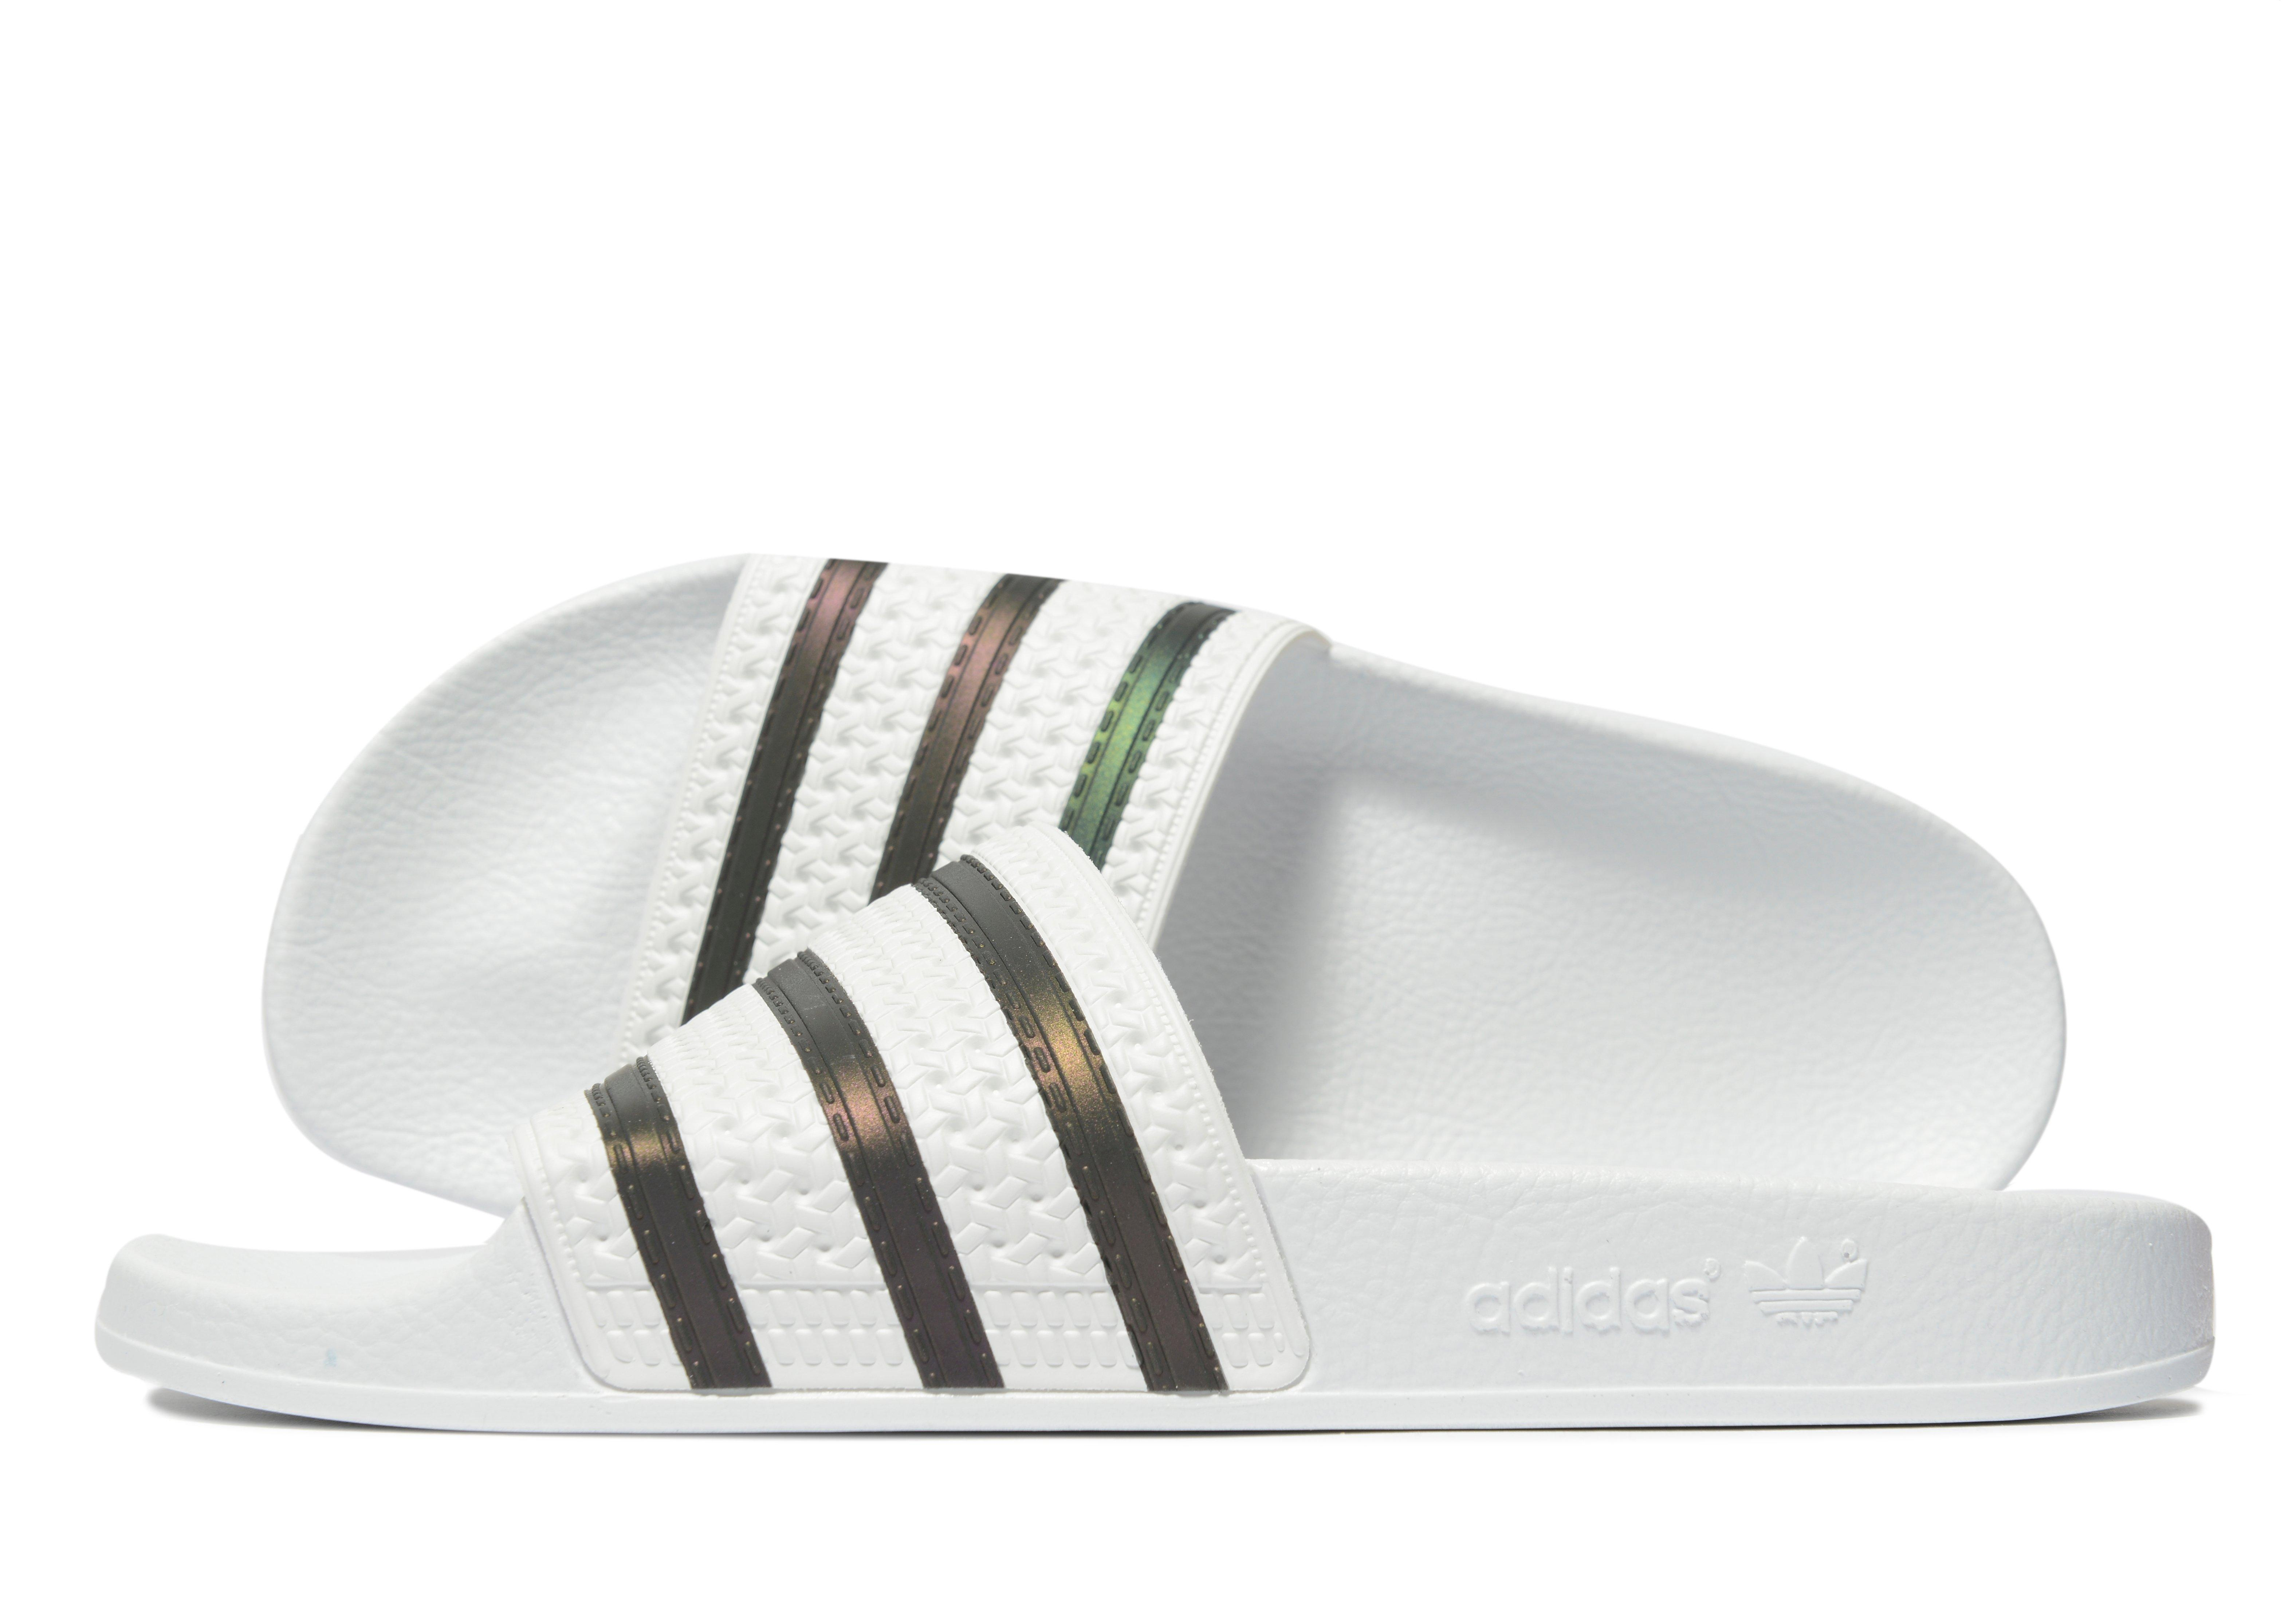 0a9f30b8c Lyst - adidas Originals Adilette Slides in White for Men